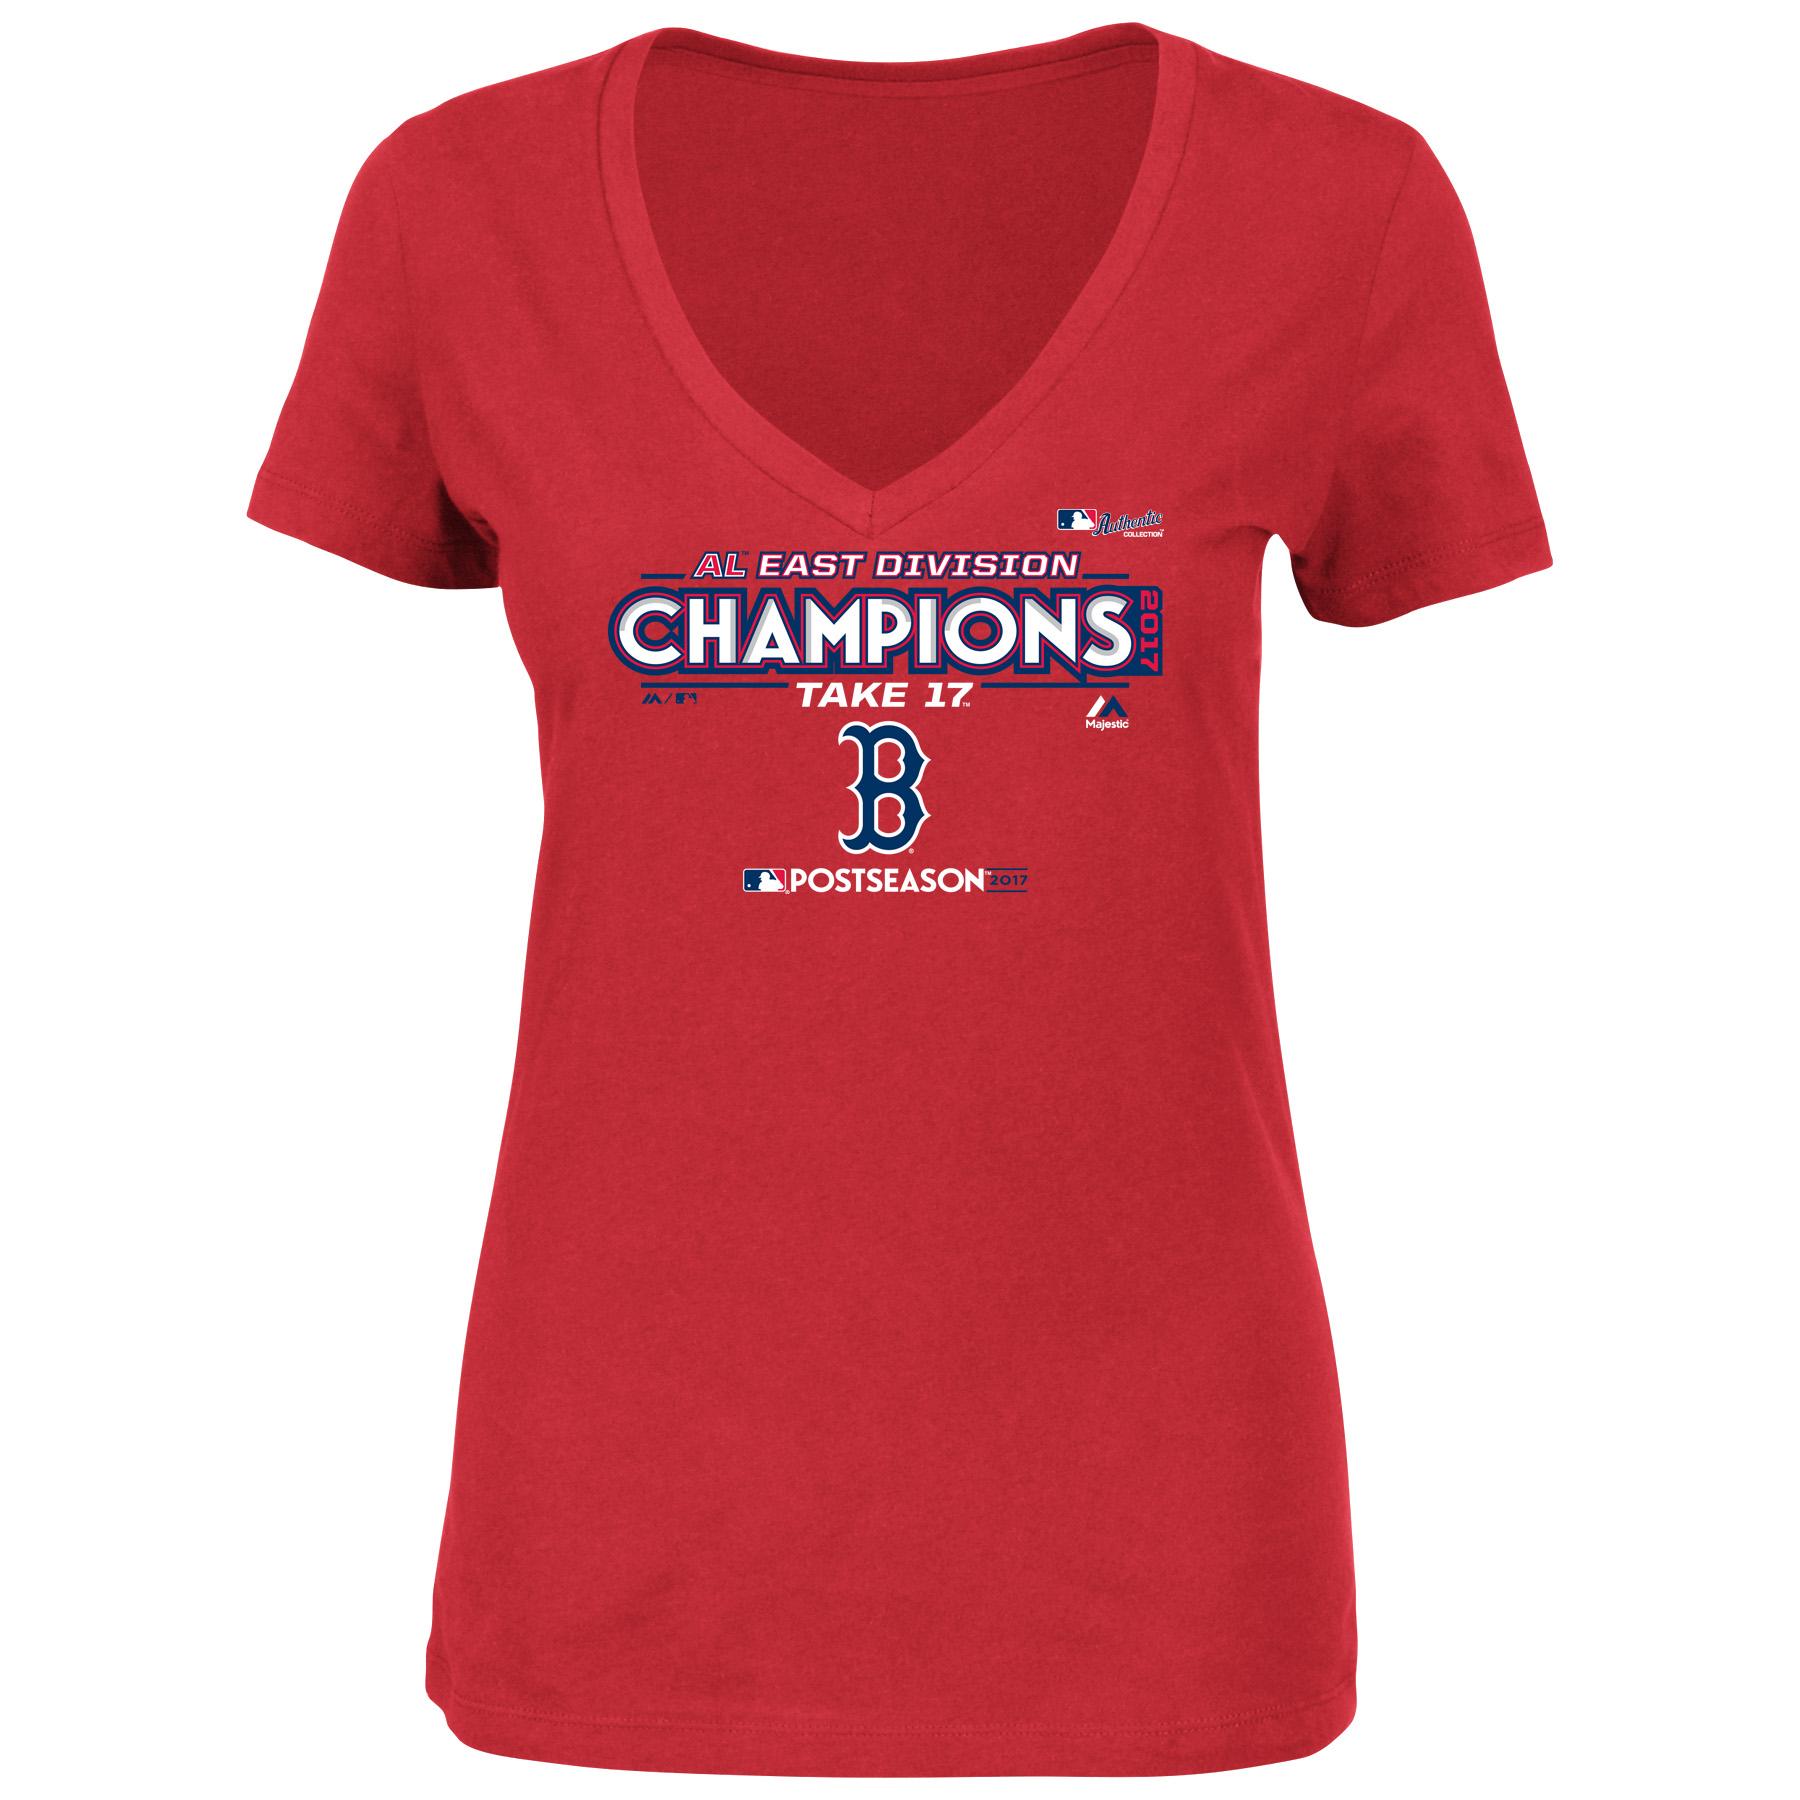 Boston Red Sox Majestic Women's 2017 AL East Division Champions Locker Room V-Neck T-Shirt - Red